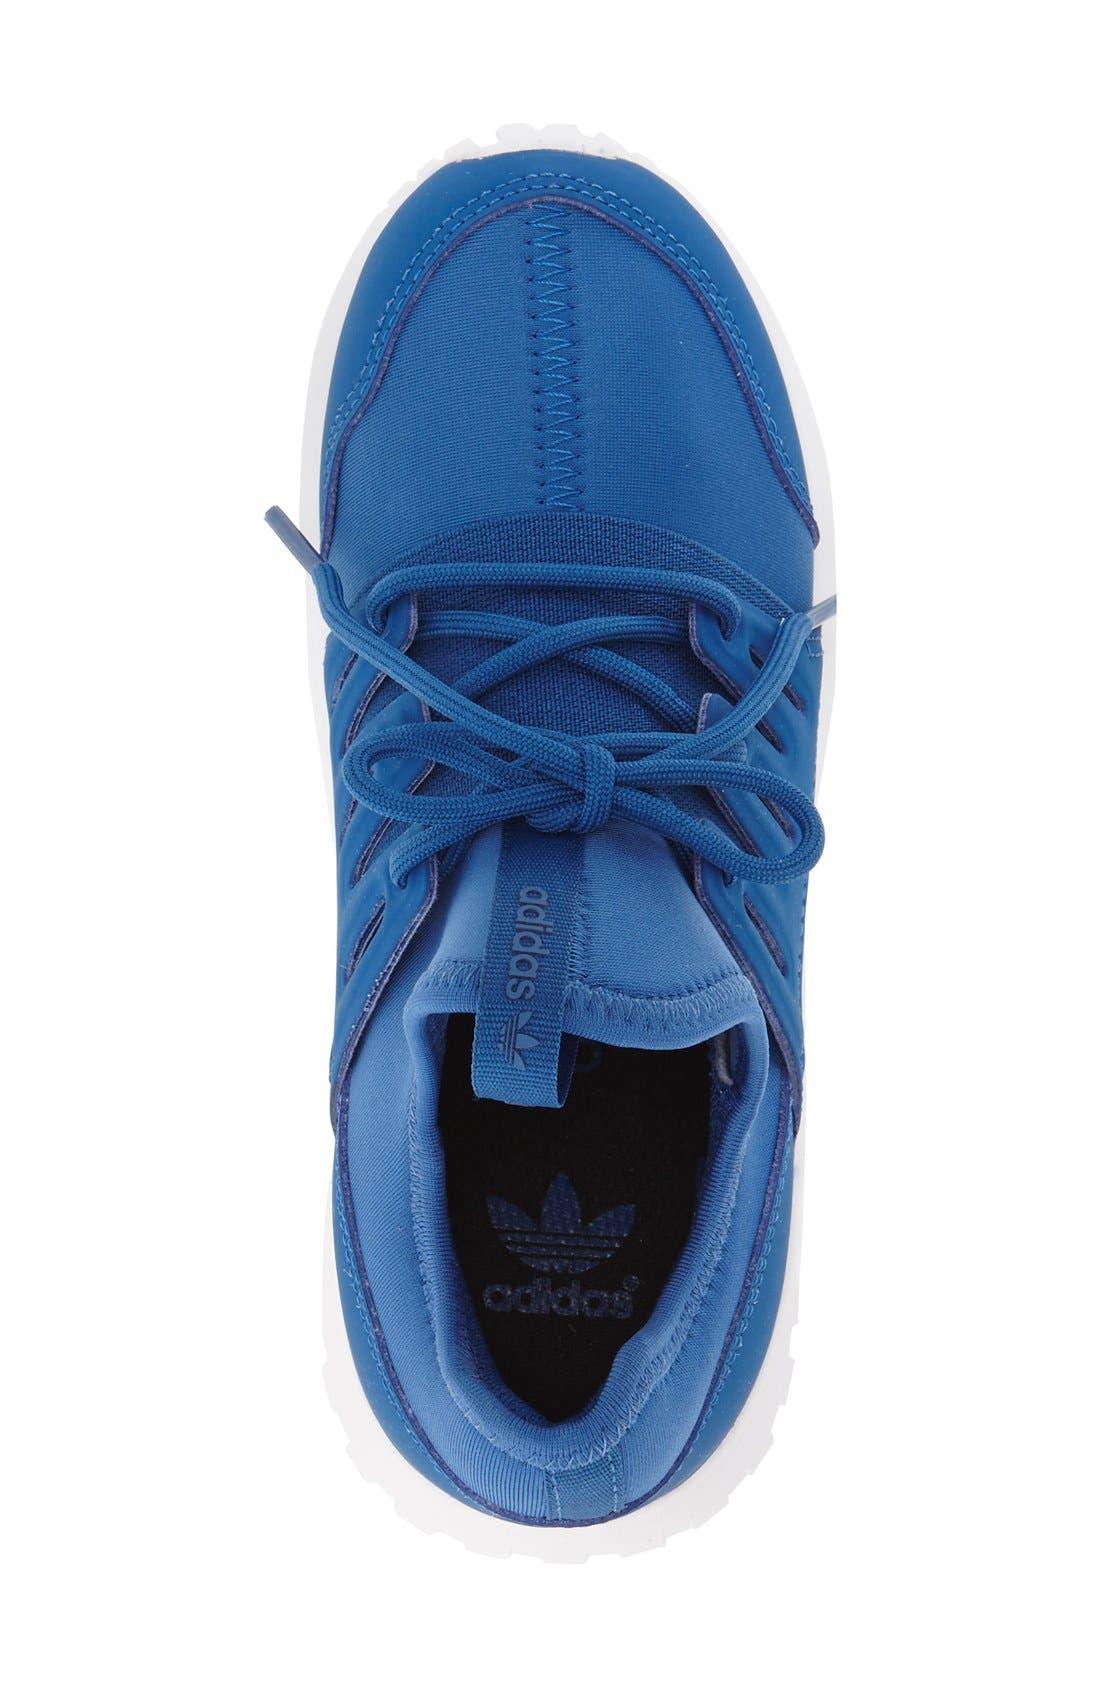 Alternate Image 3  - adidas 'Tubular Radial K' Sneaker (Toddler, Little Kid & Big Kid)